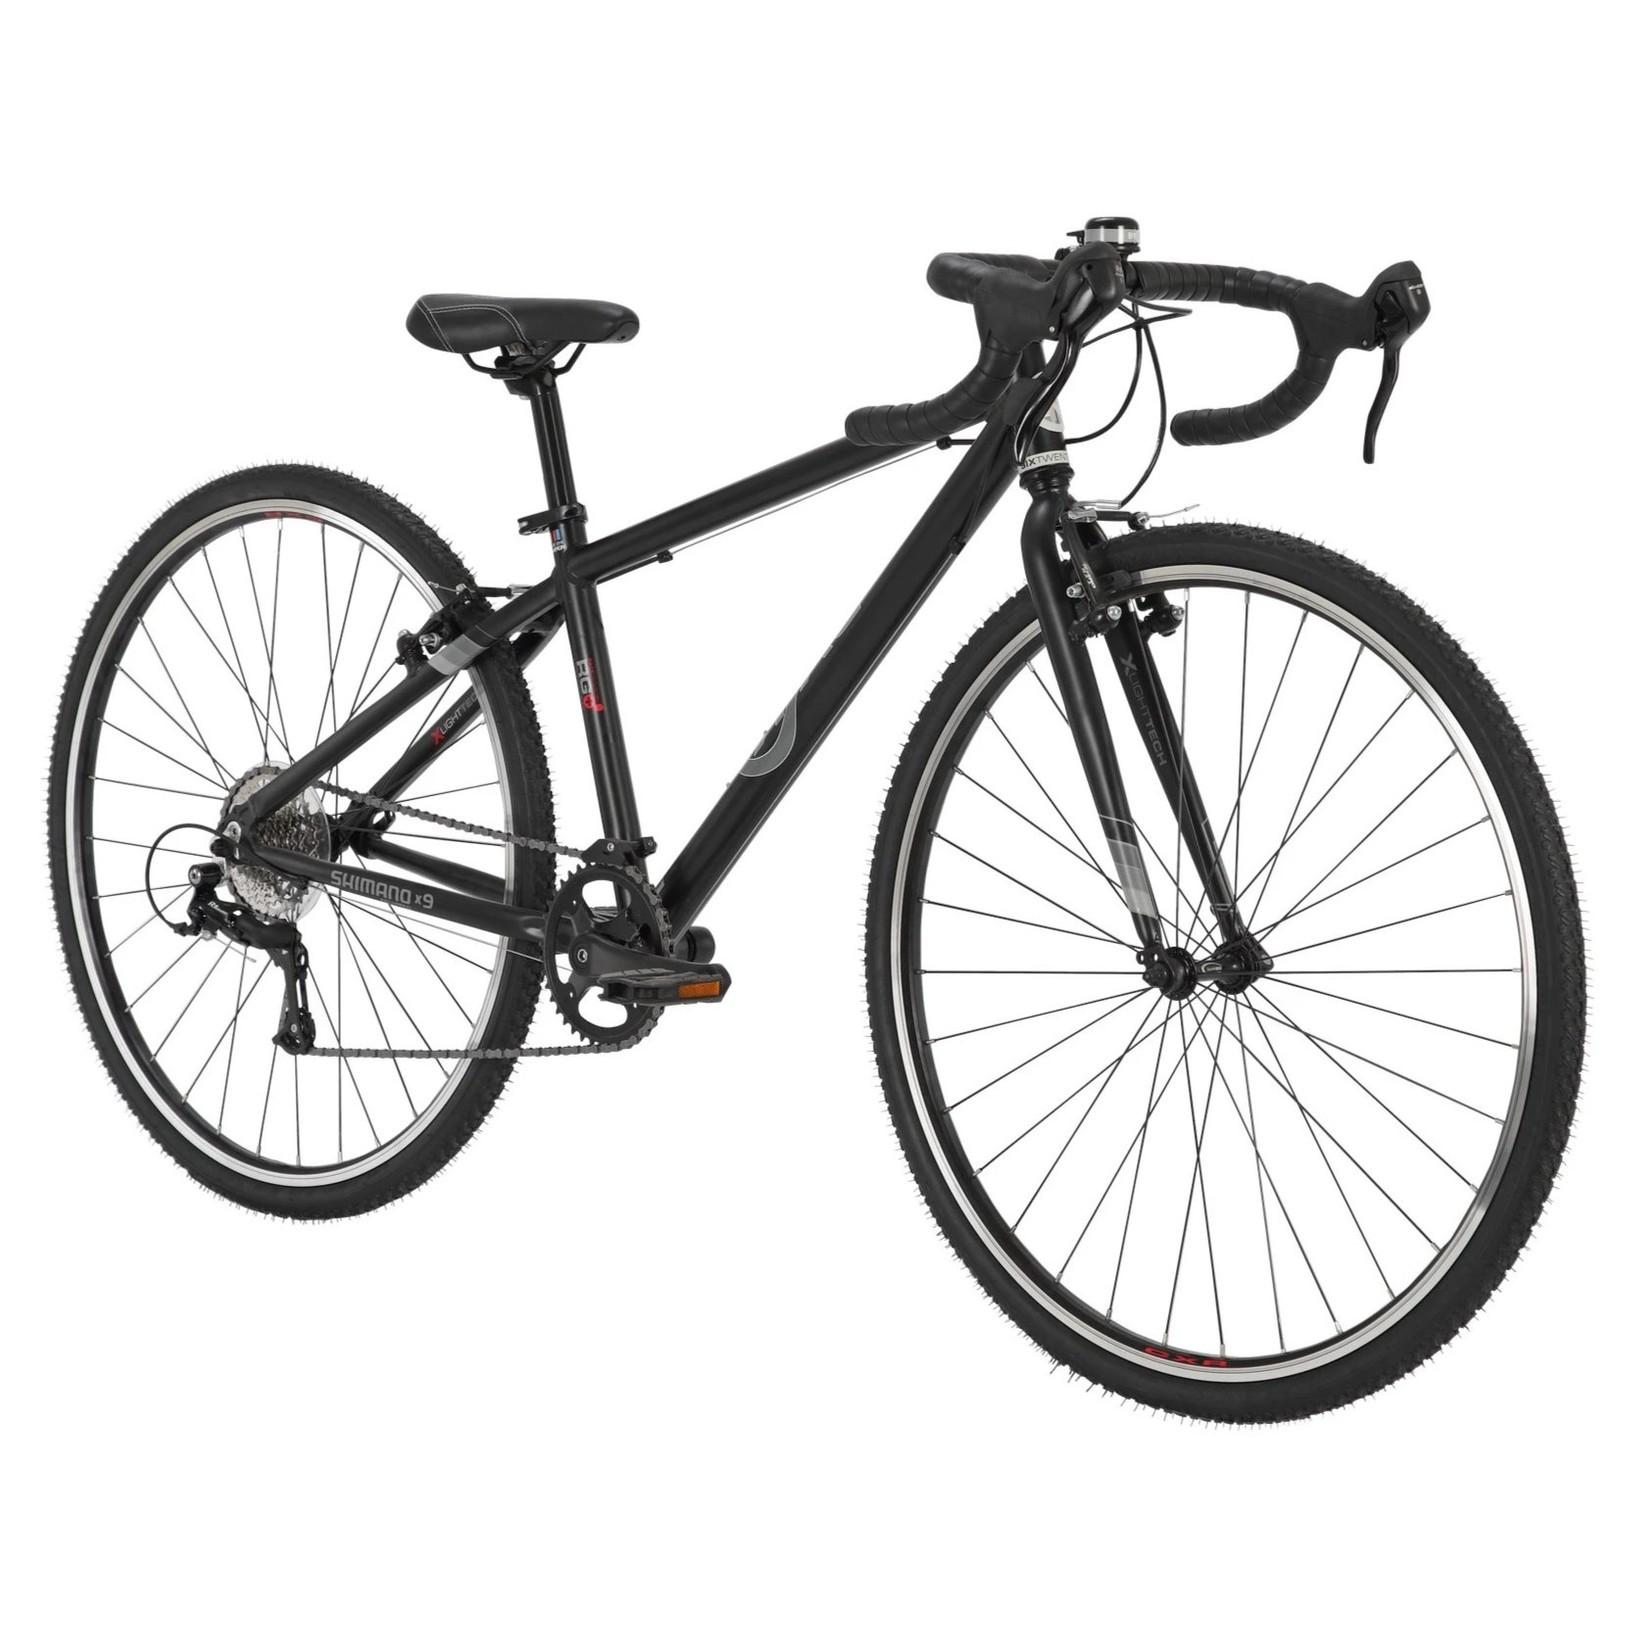 BYK BYK, E-620 Cyclocross